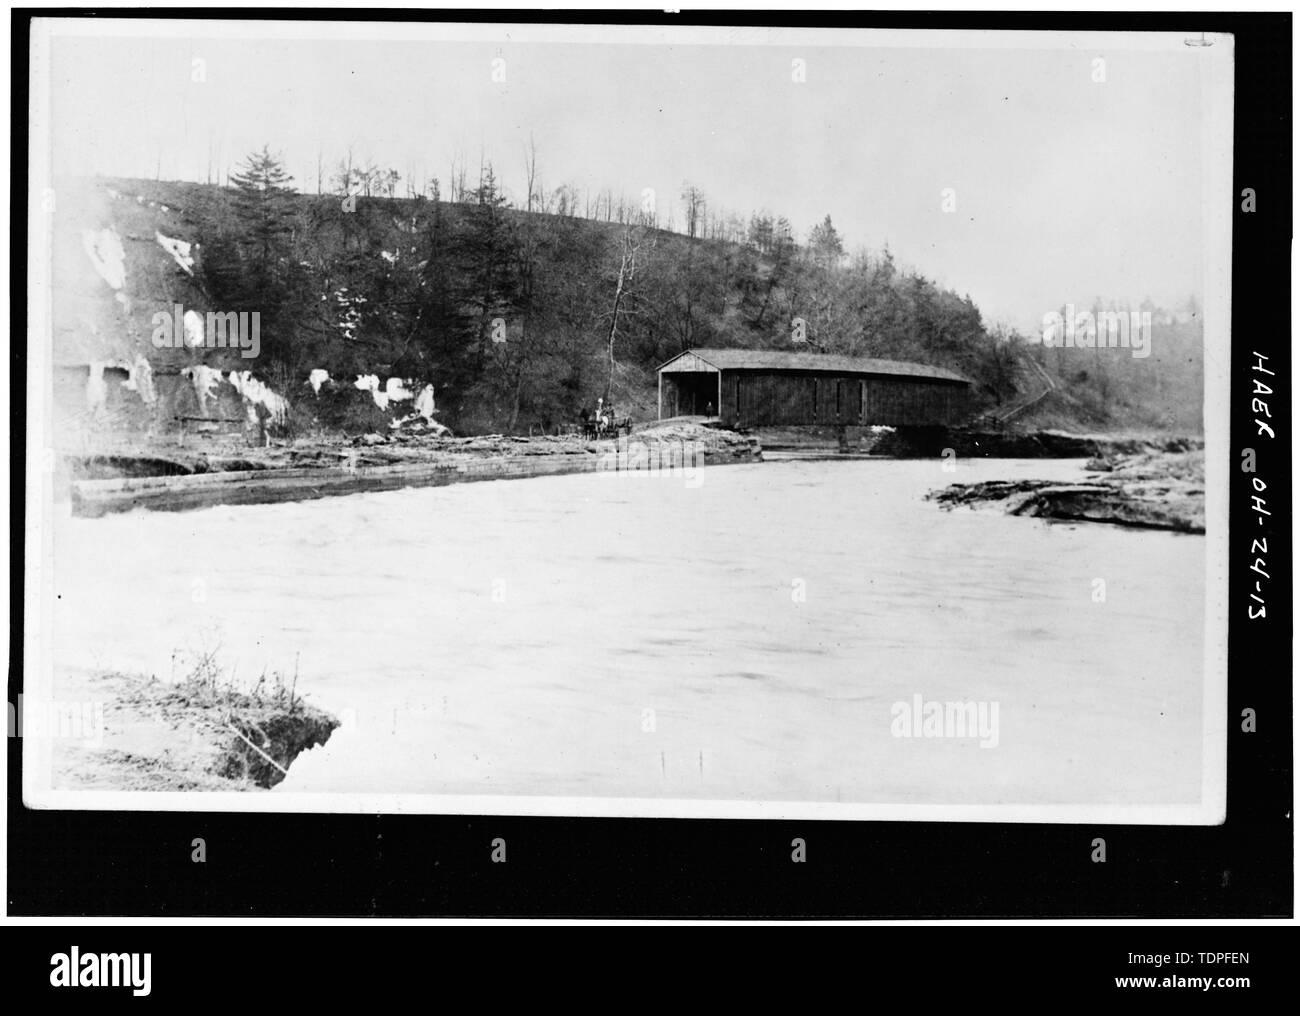 (from collectin of Mrs. L.J. Fargo, Lexington, Ohio) showing COVERED BRIDGE OVER ASTABULA RIVER. - Forty-sixth Street Bridge, Spanning Ashtabula River, Ashtabula, Ashtabula County, OH - Stock Image